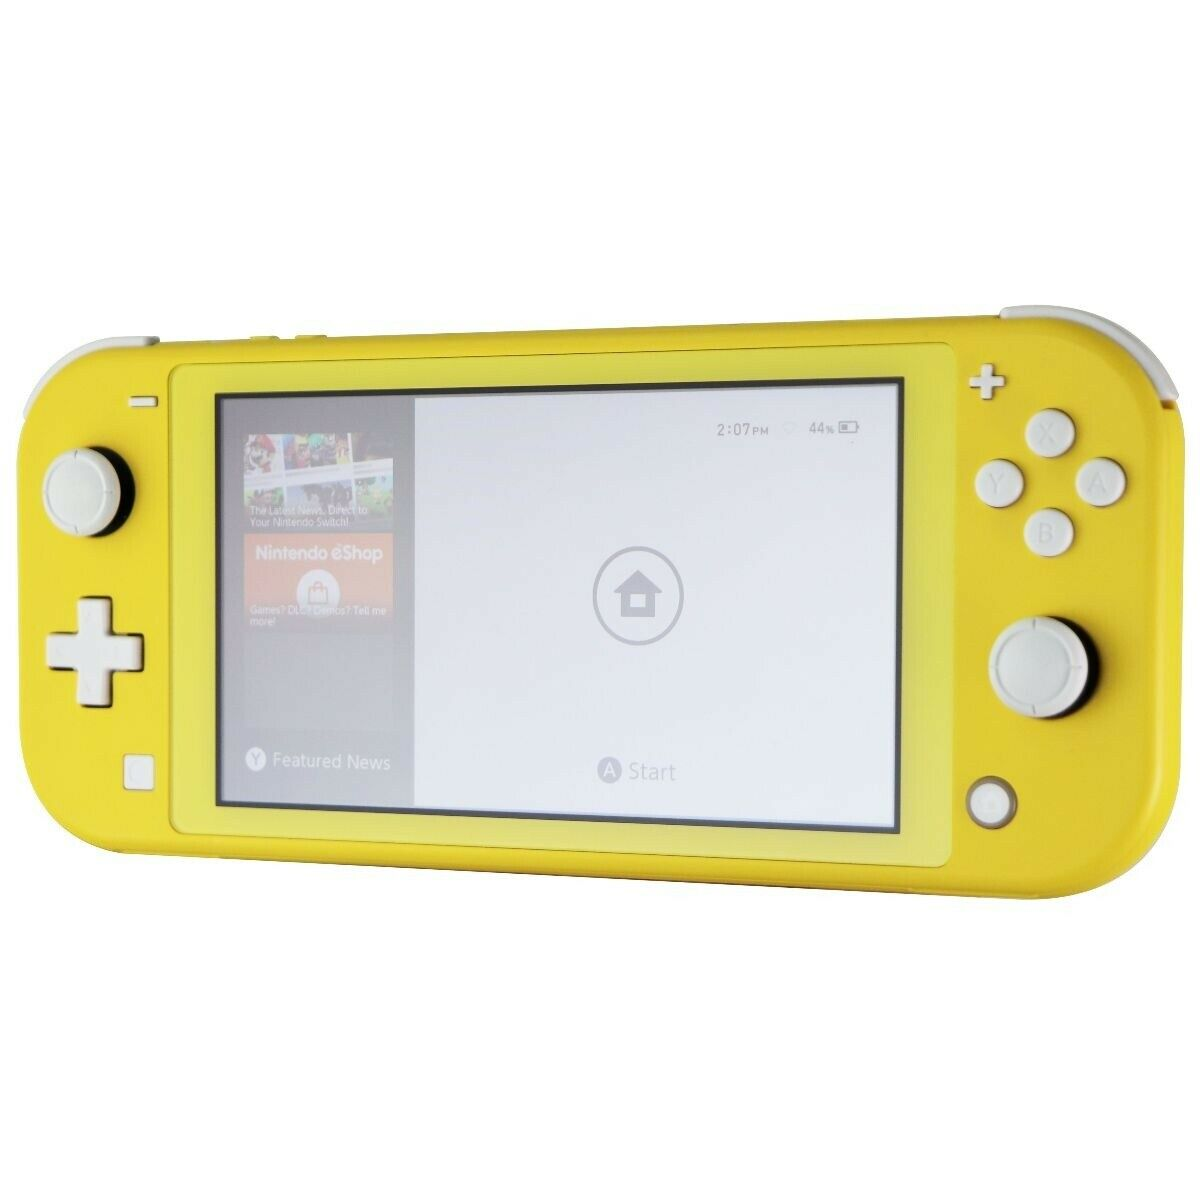 FAIR Nintendo Switch Lite Handheld Gaming Console - Yellow (HDH-001)